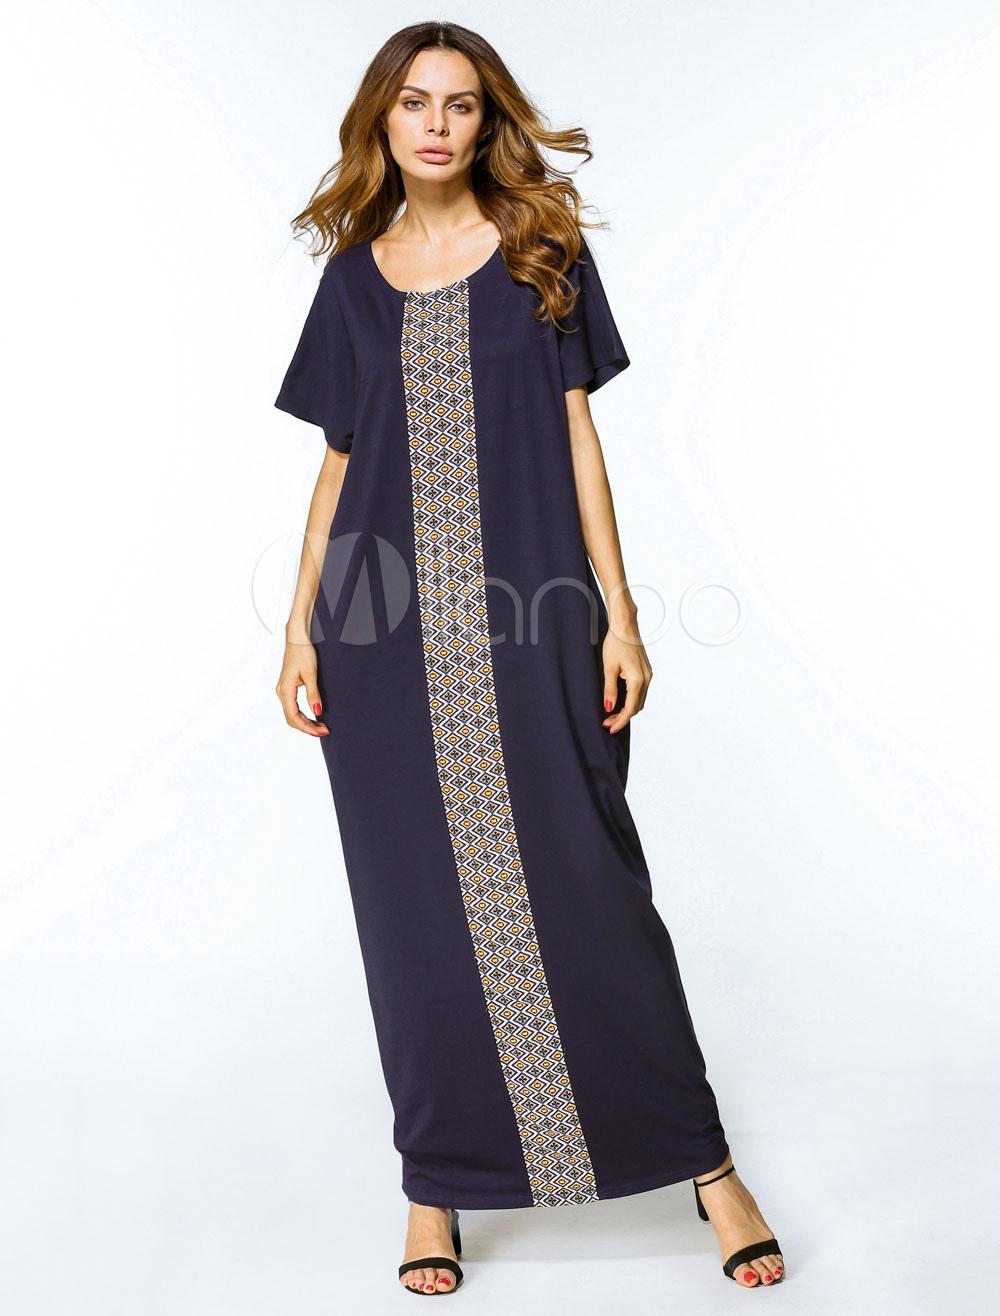 Maxi Kaftan Dress Blue Women Short Sleeve Oversized Tunic Dress (Women\\'s Clothing Arabian Clothing) photo